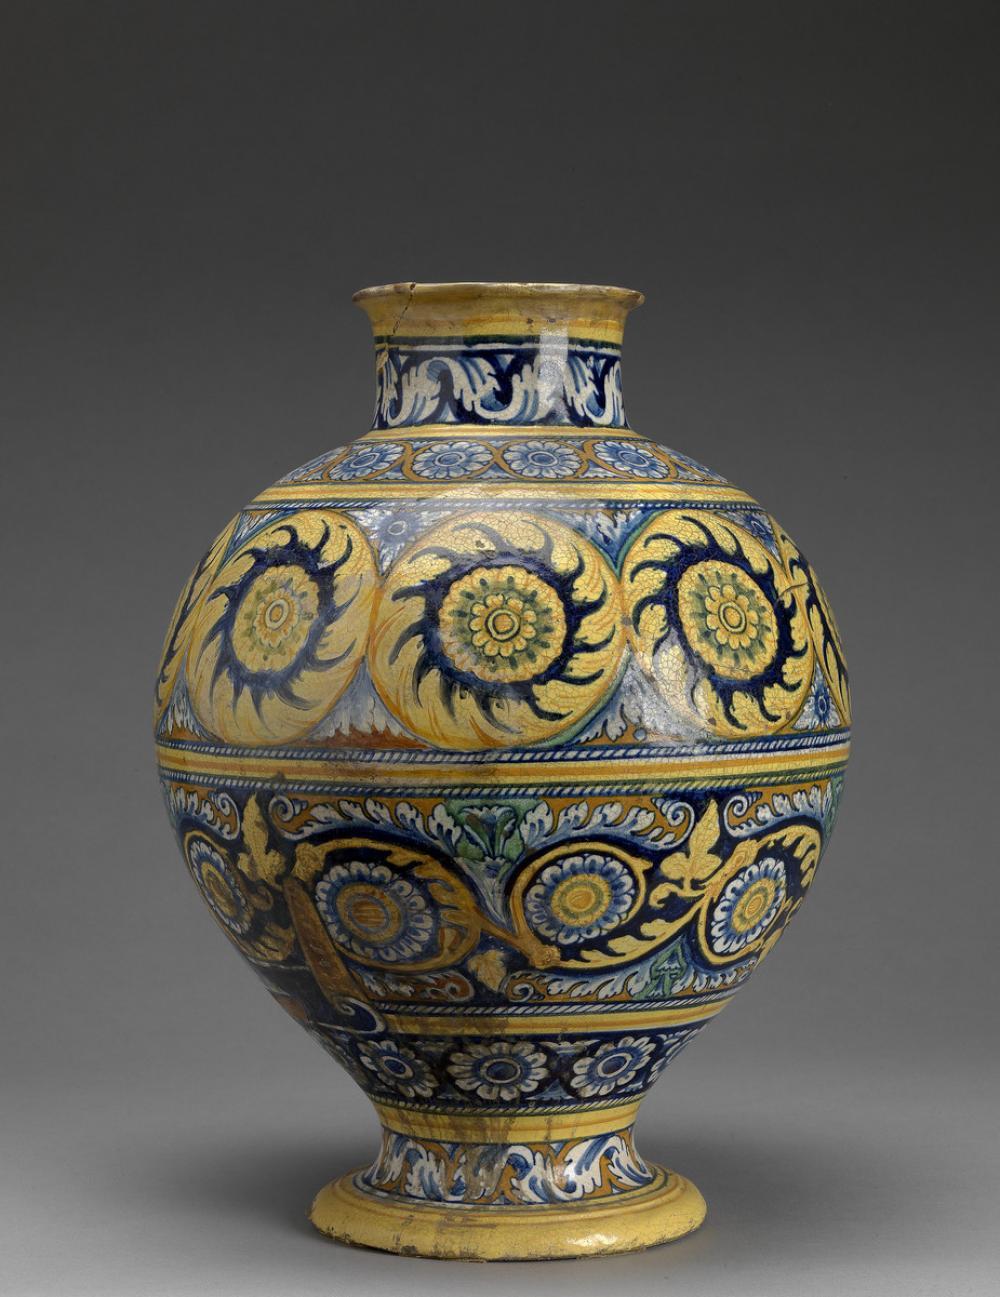 Italian, Globular jar